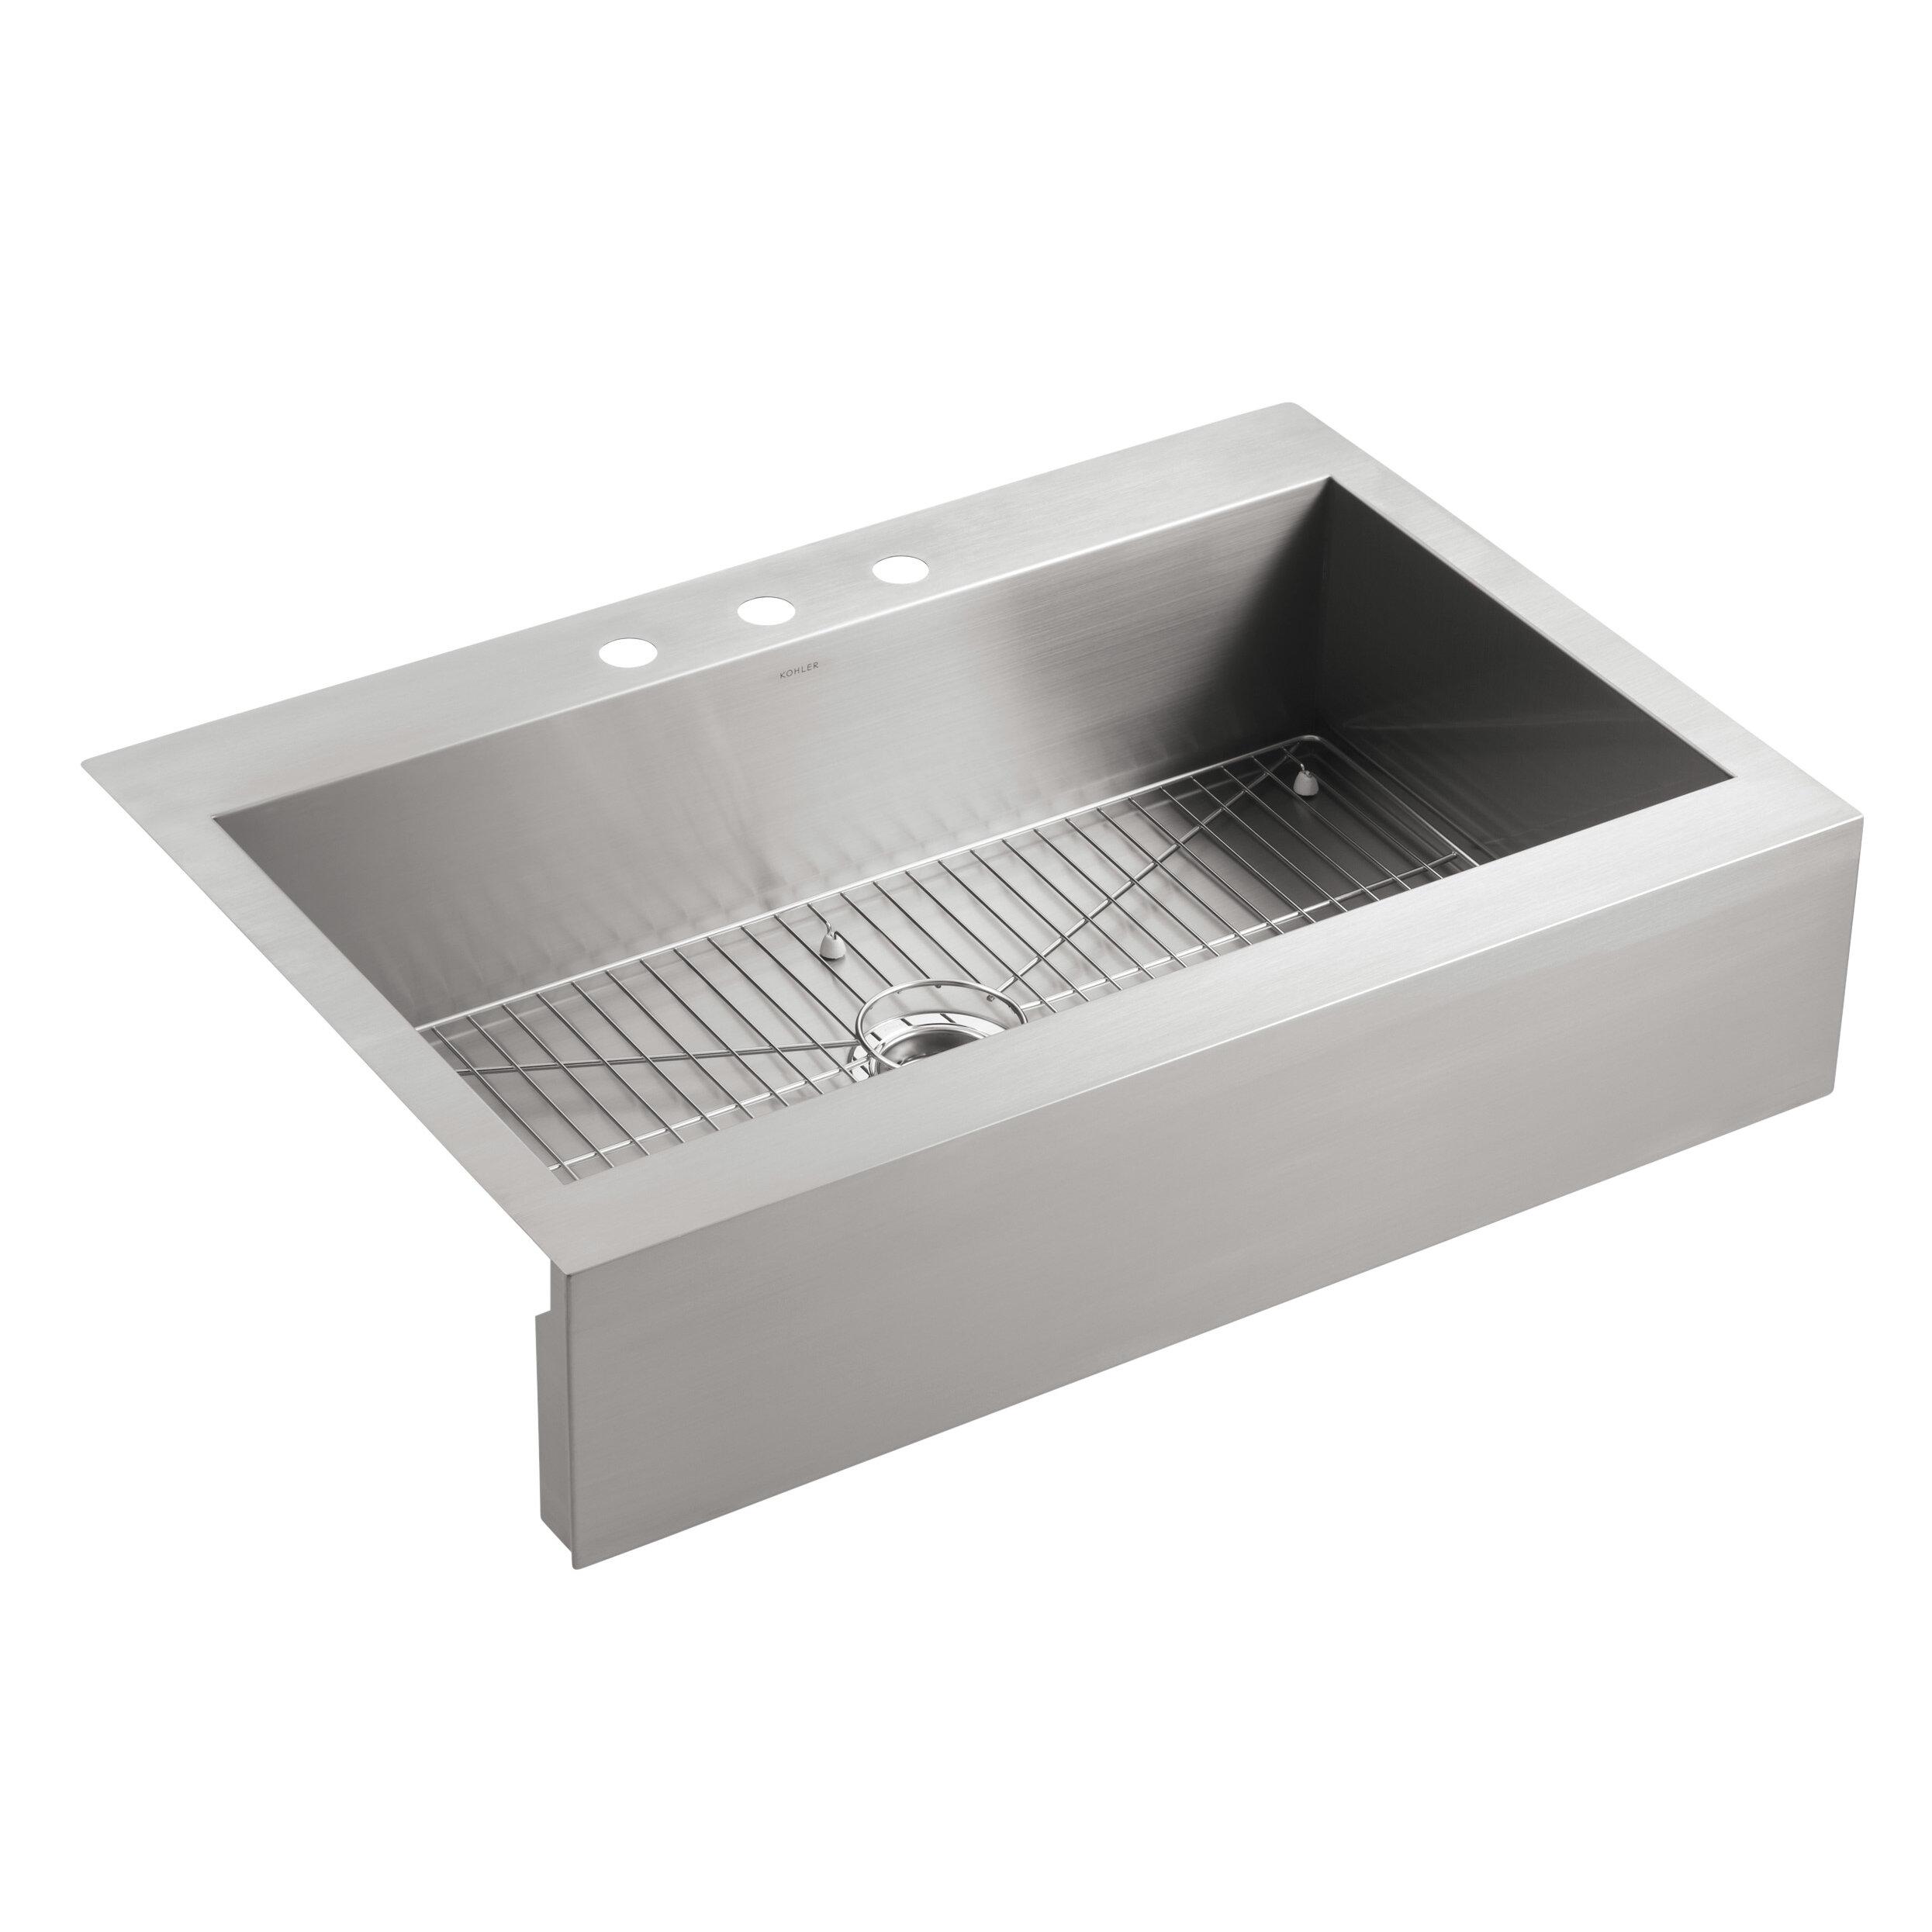 K 3942 3 Na Kohler Vault 36 X 24 Top Mount Farmhouse Kitchen Sink Reviews